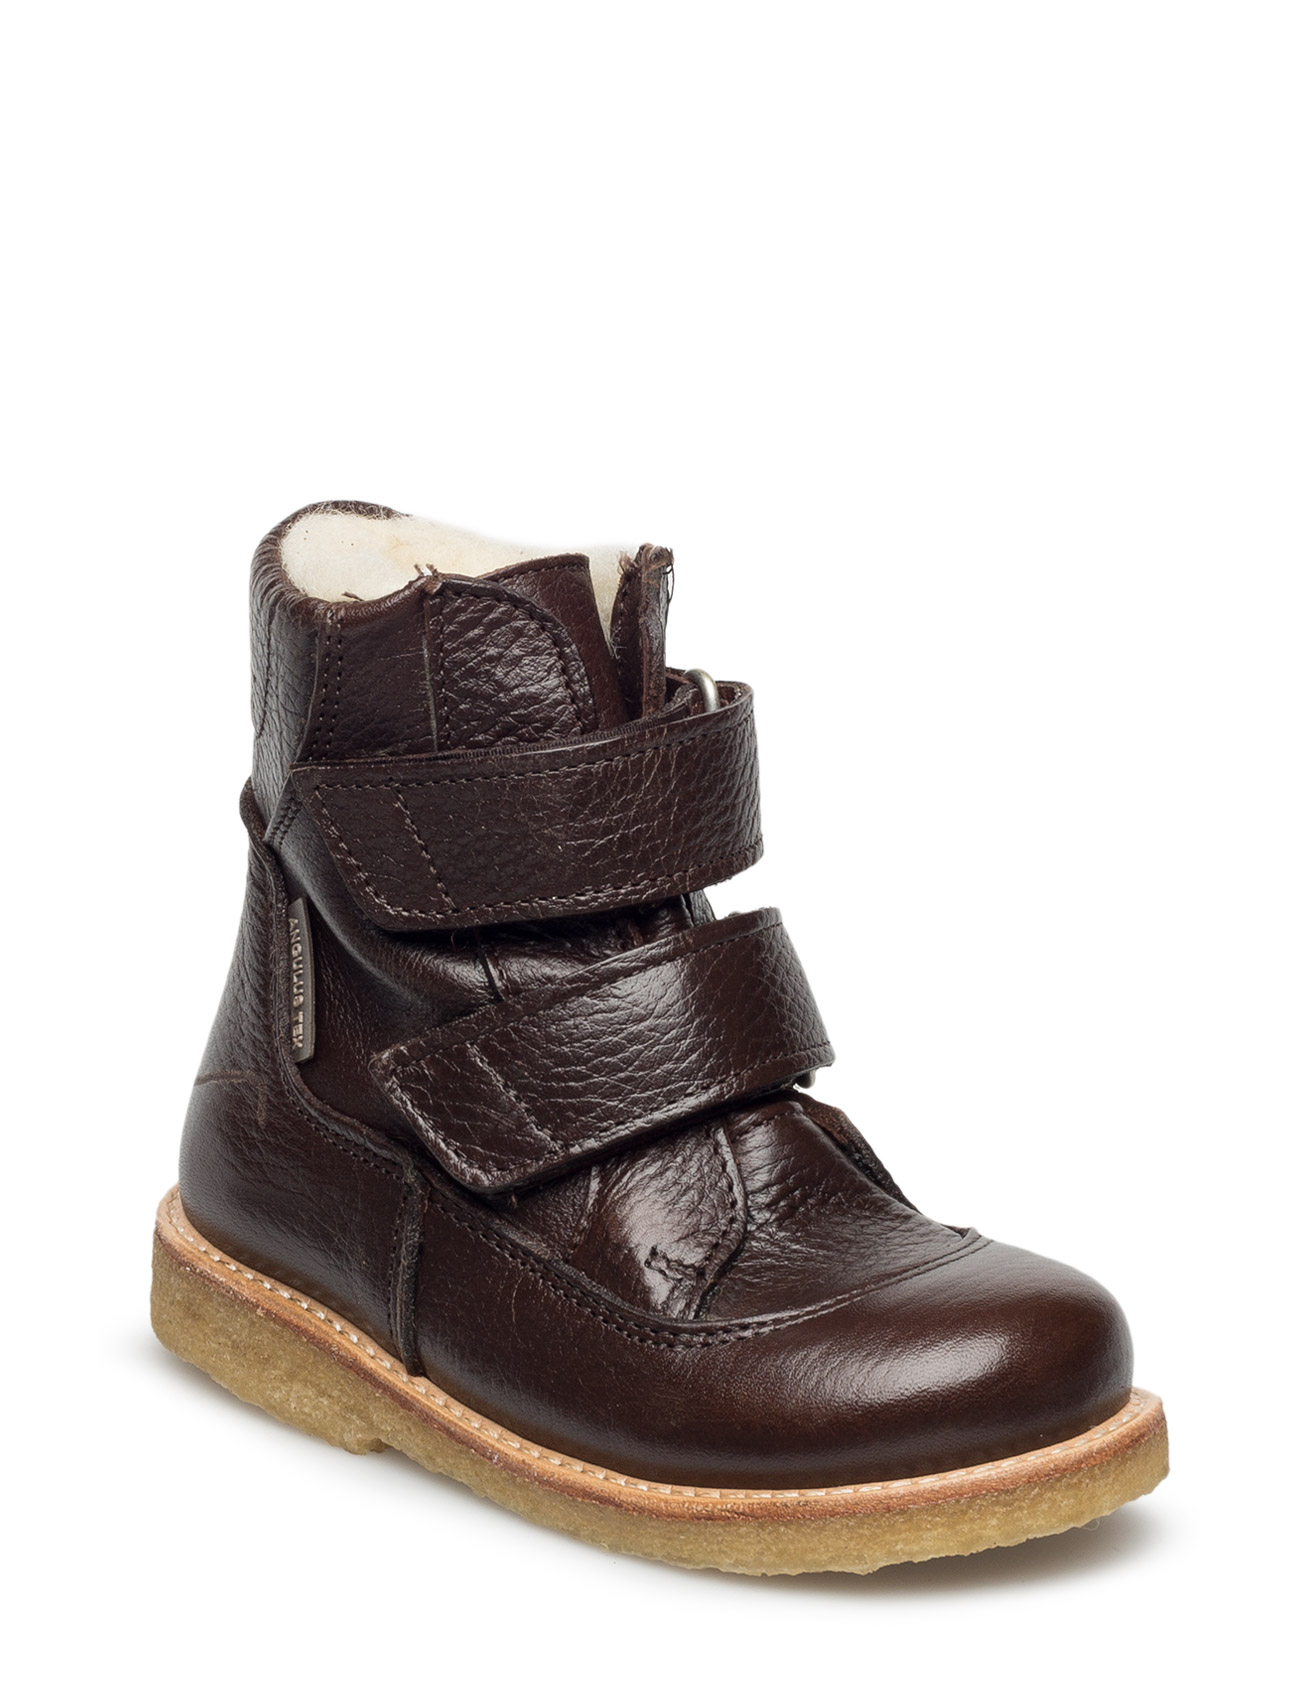 2134 ANGULUS Støvler til Børn i